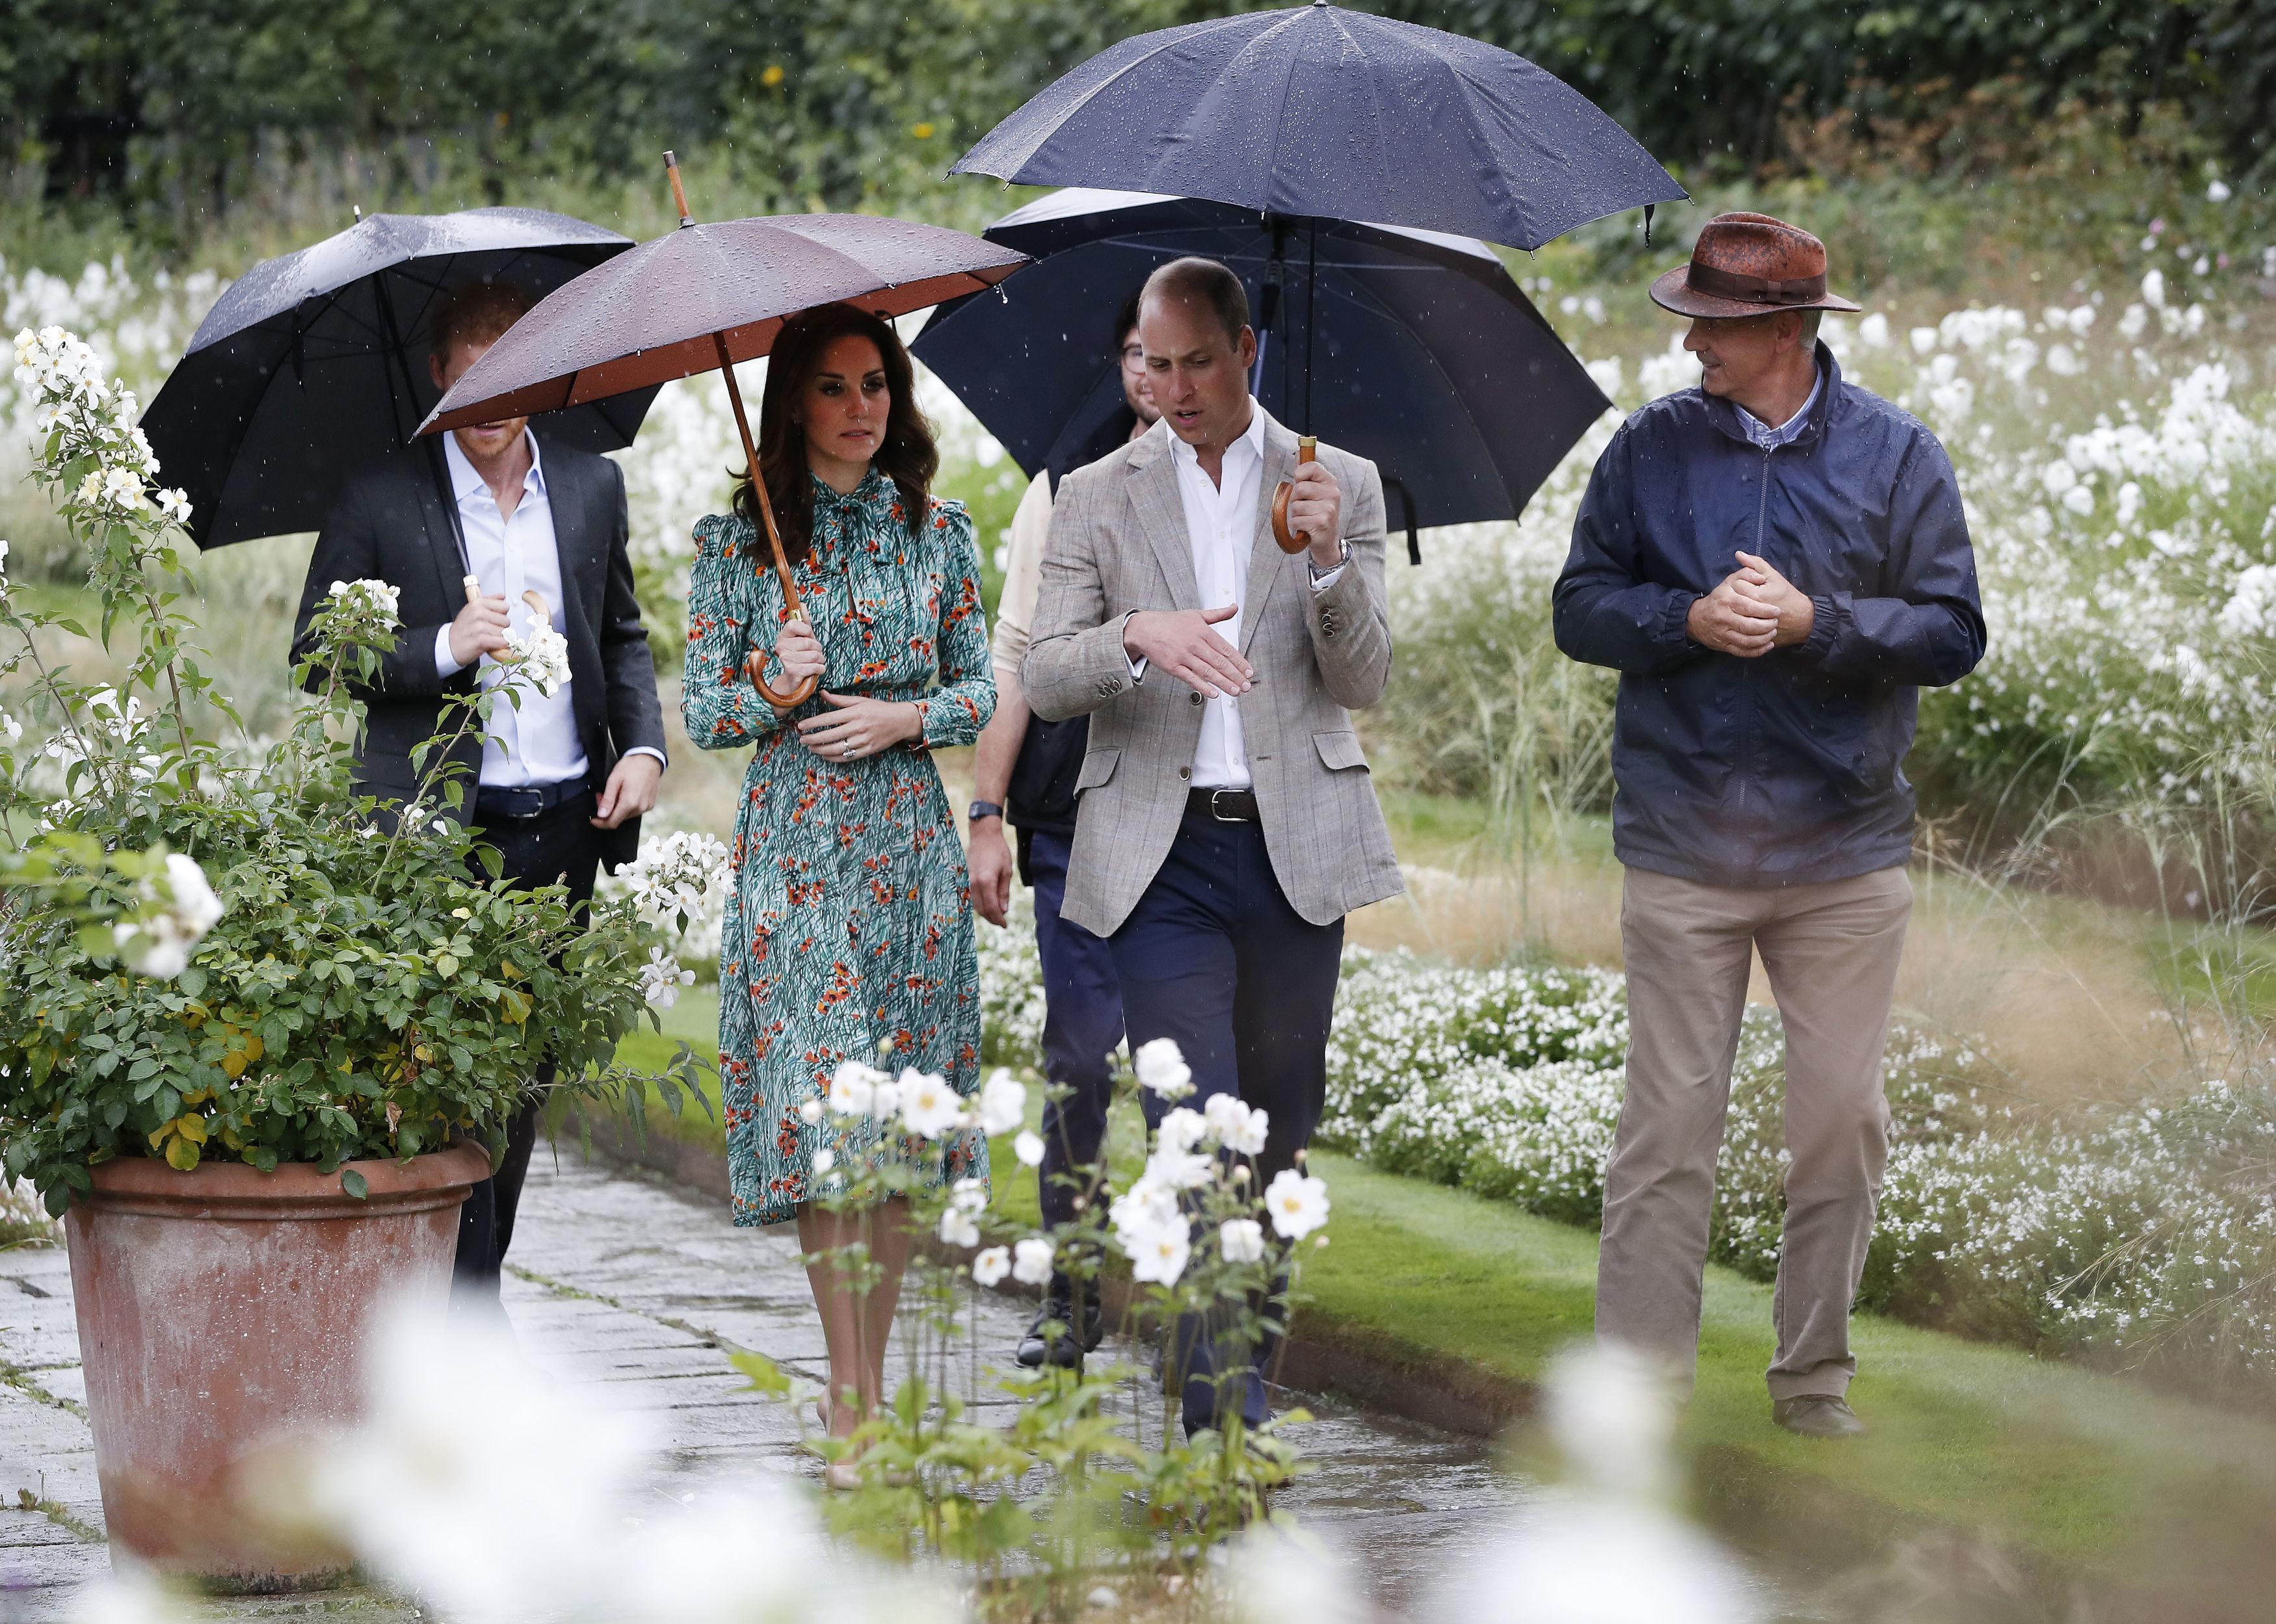 Prince William and Harry visit Diana's memorial ga